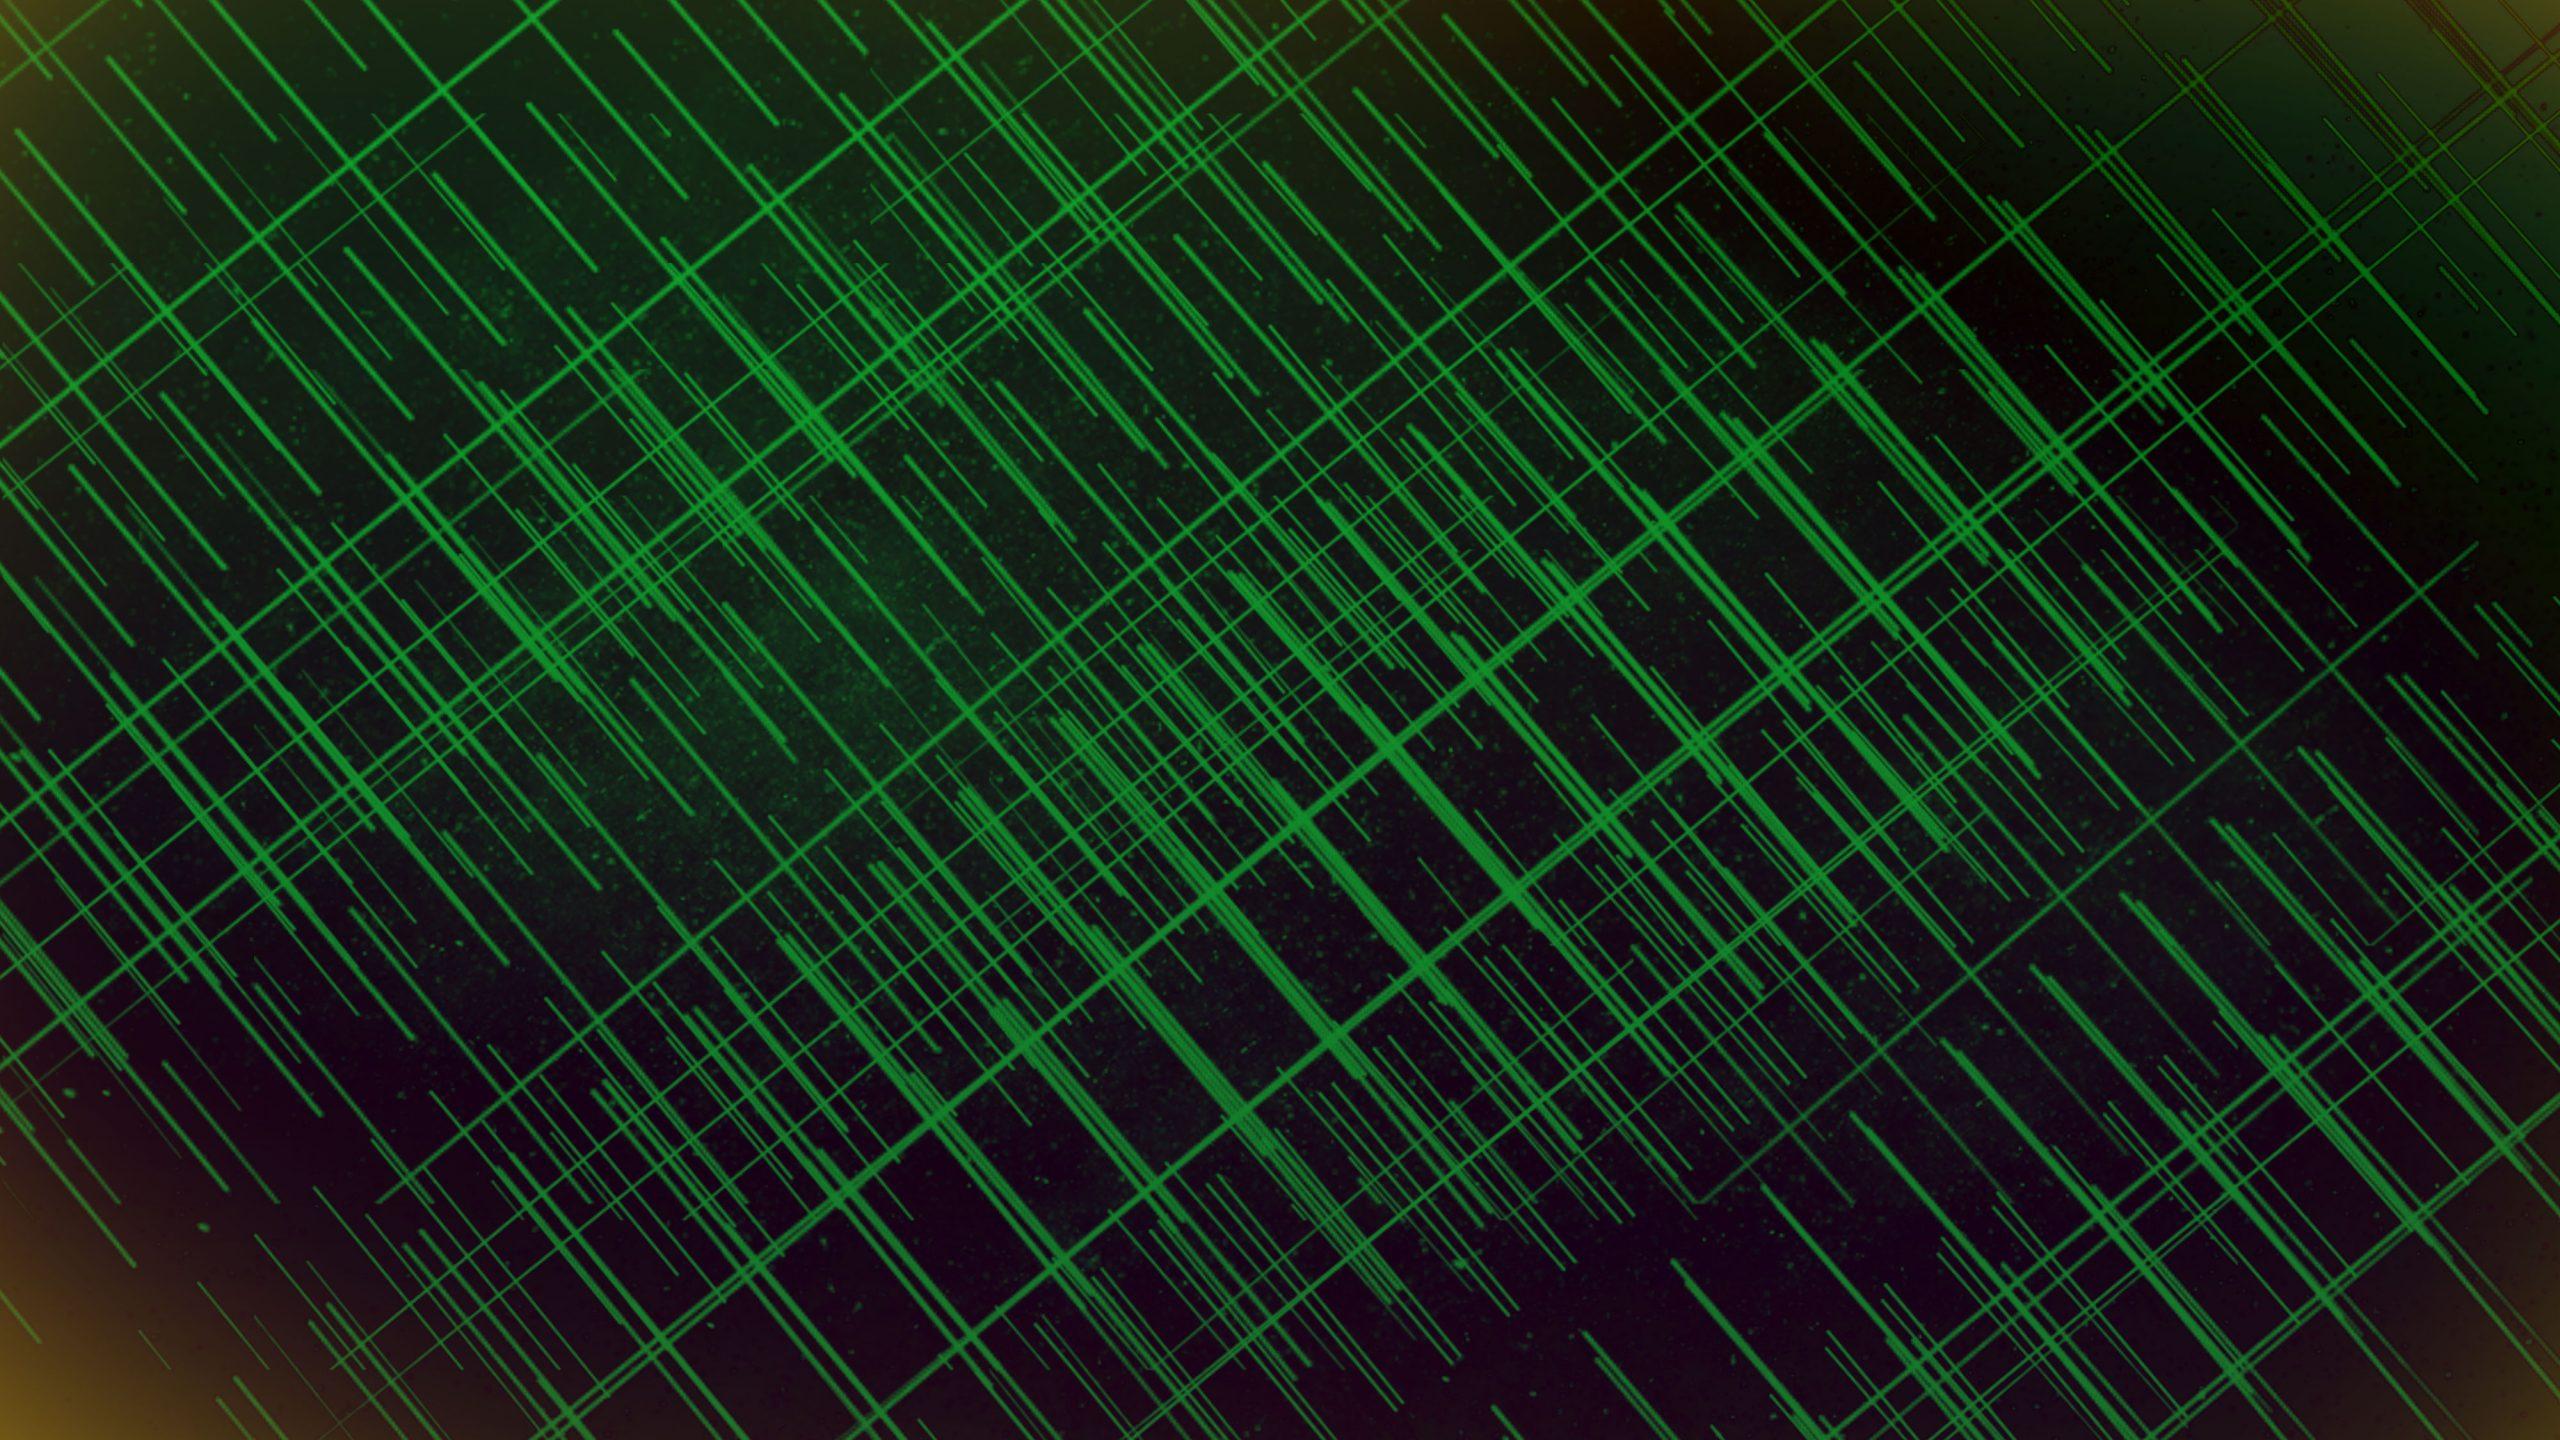 Green Spike shaped wallpaper